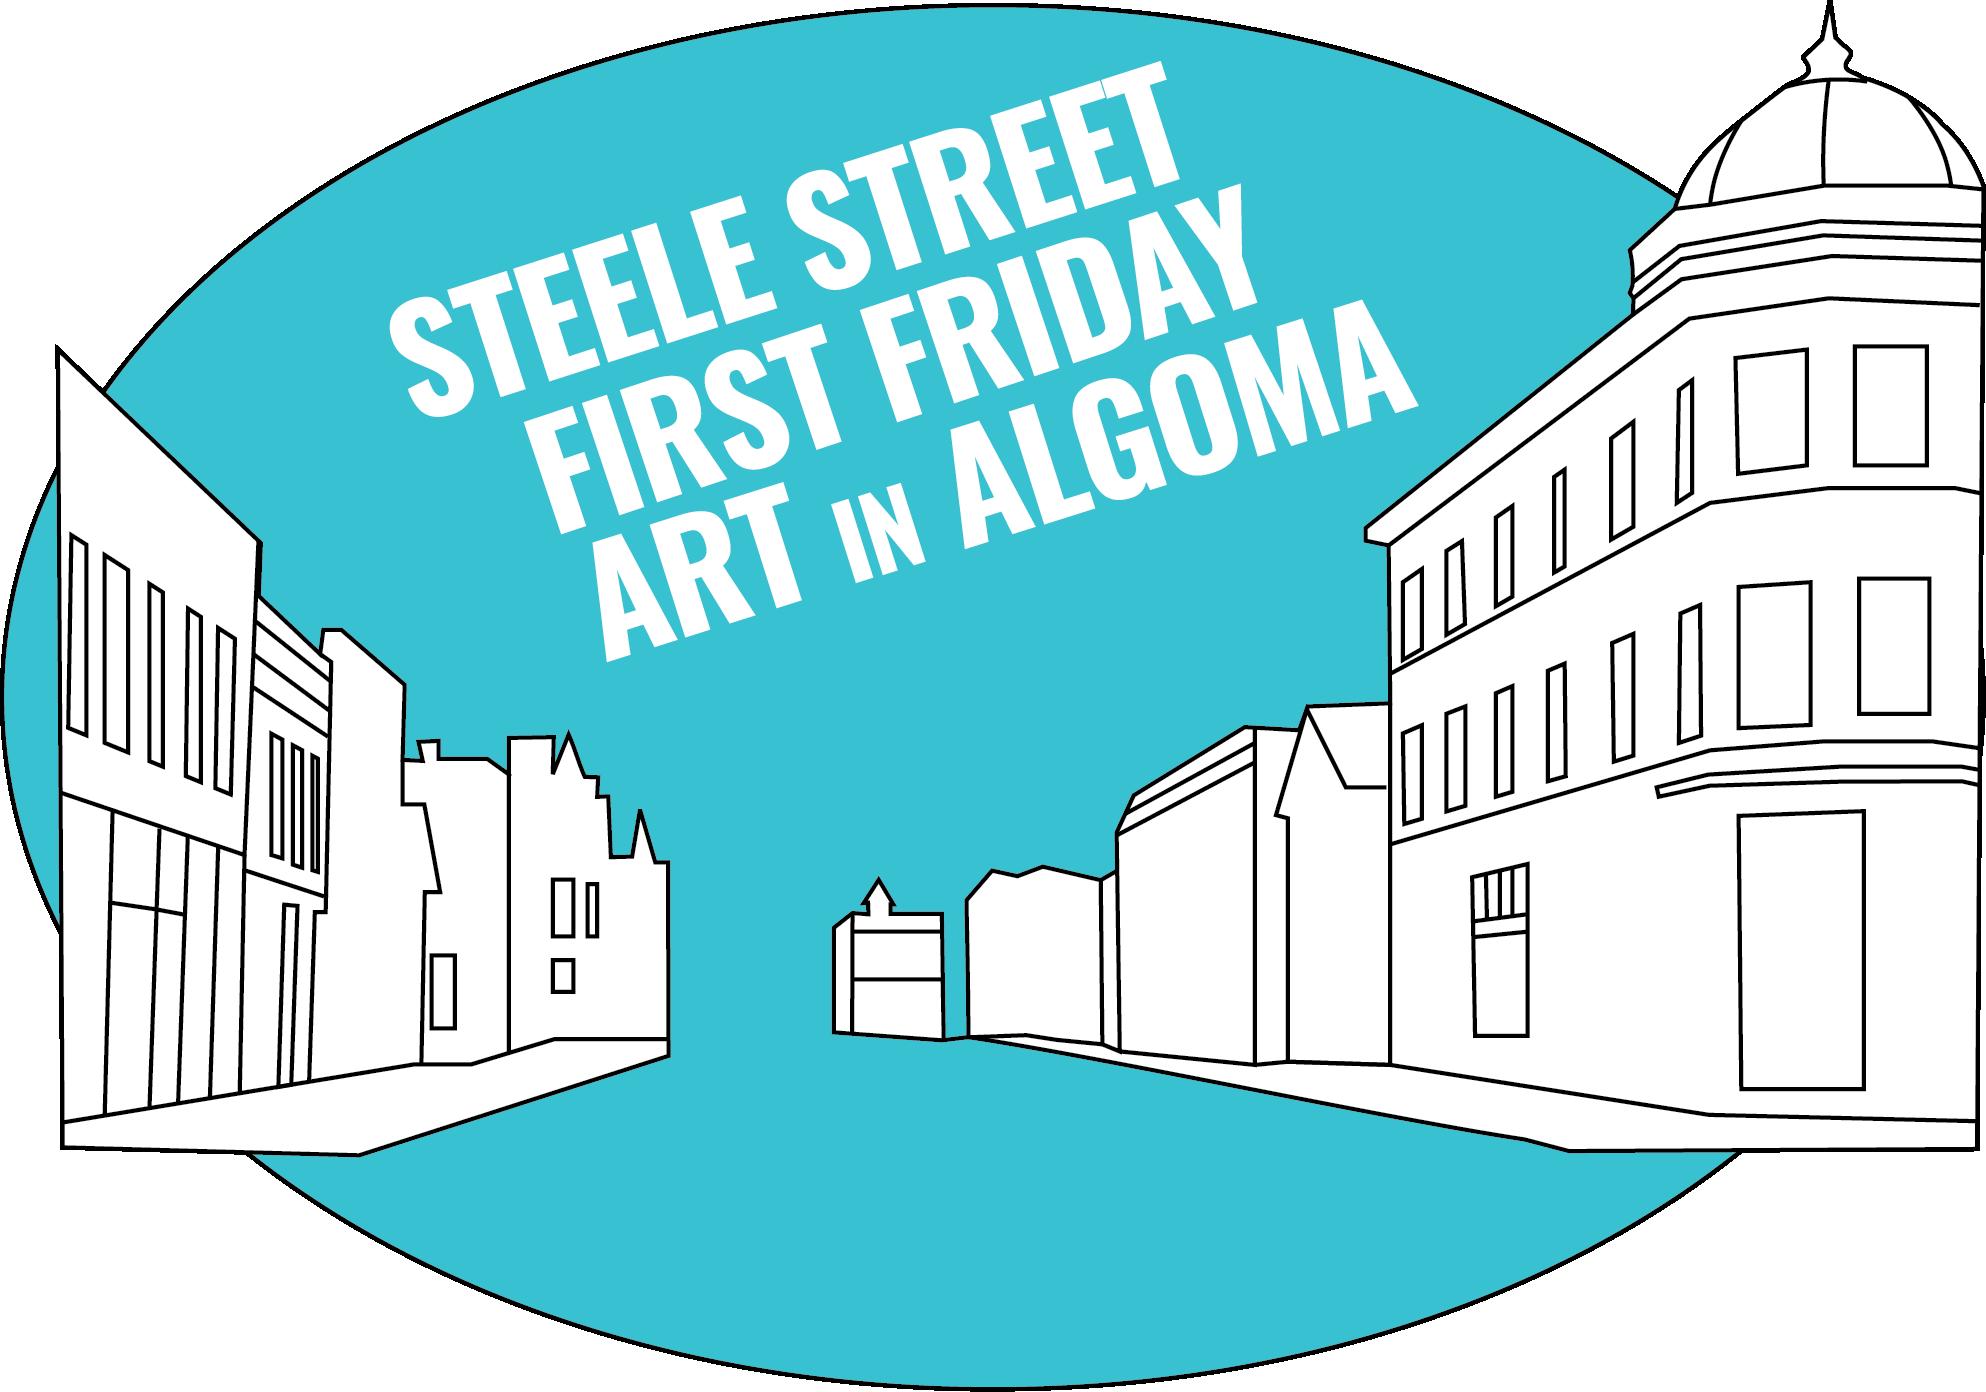 steele-street-art-4